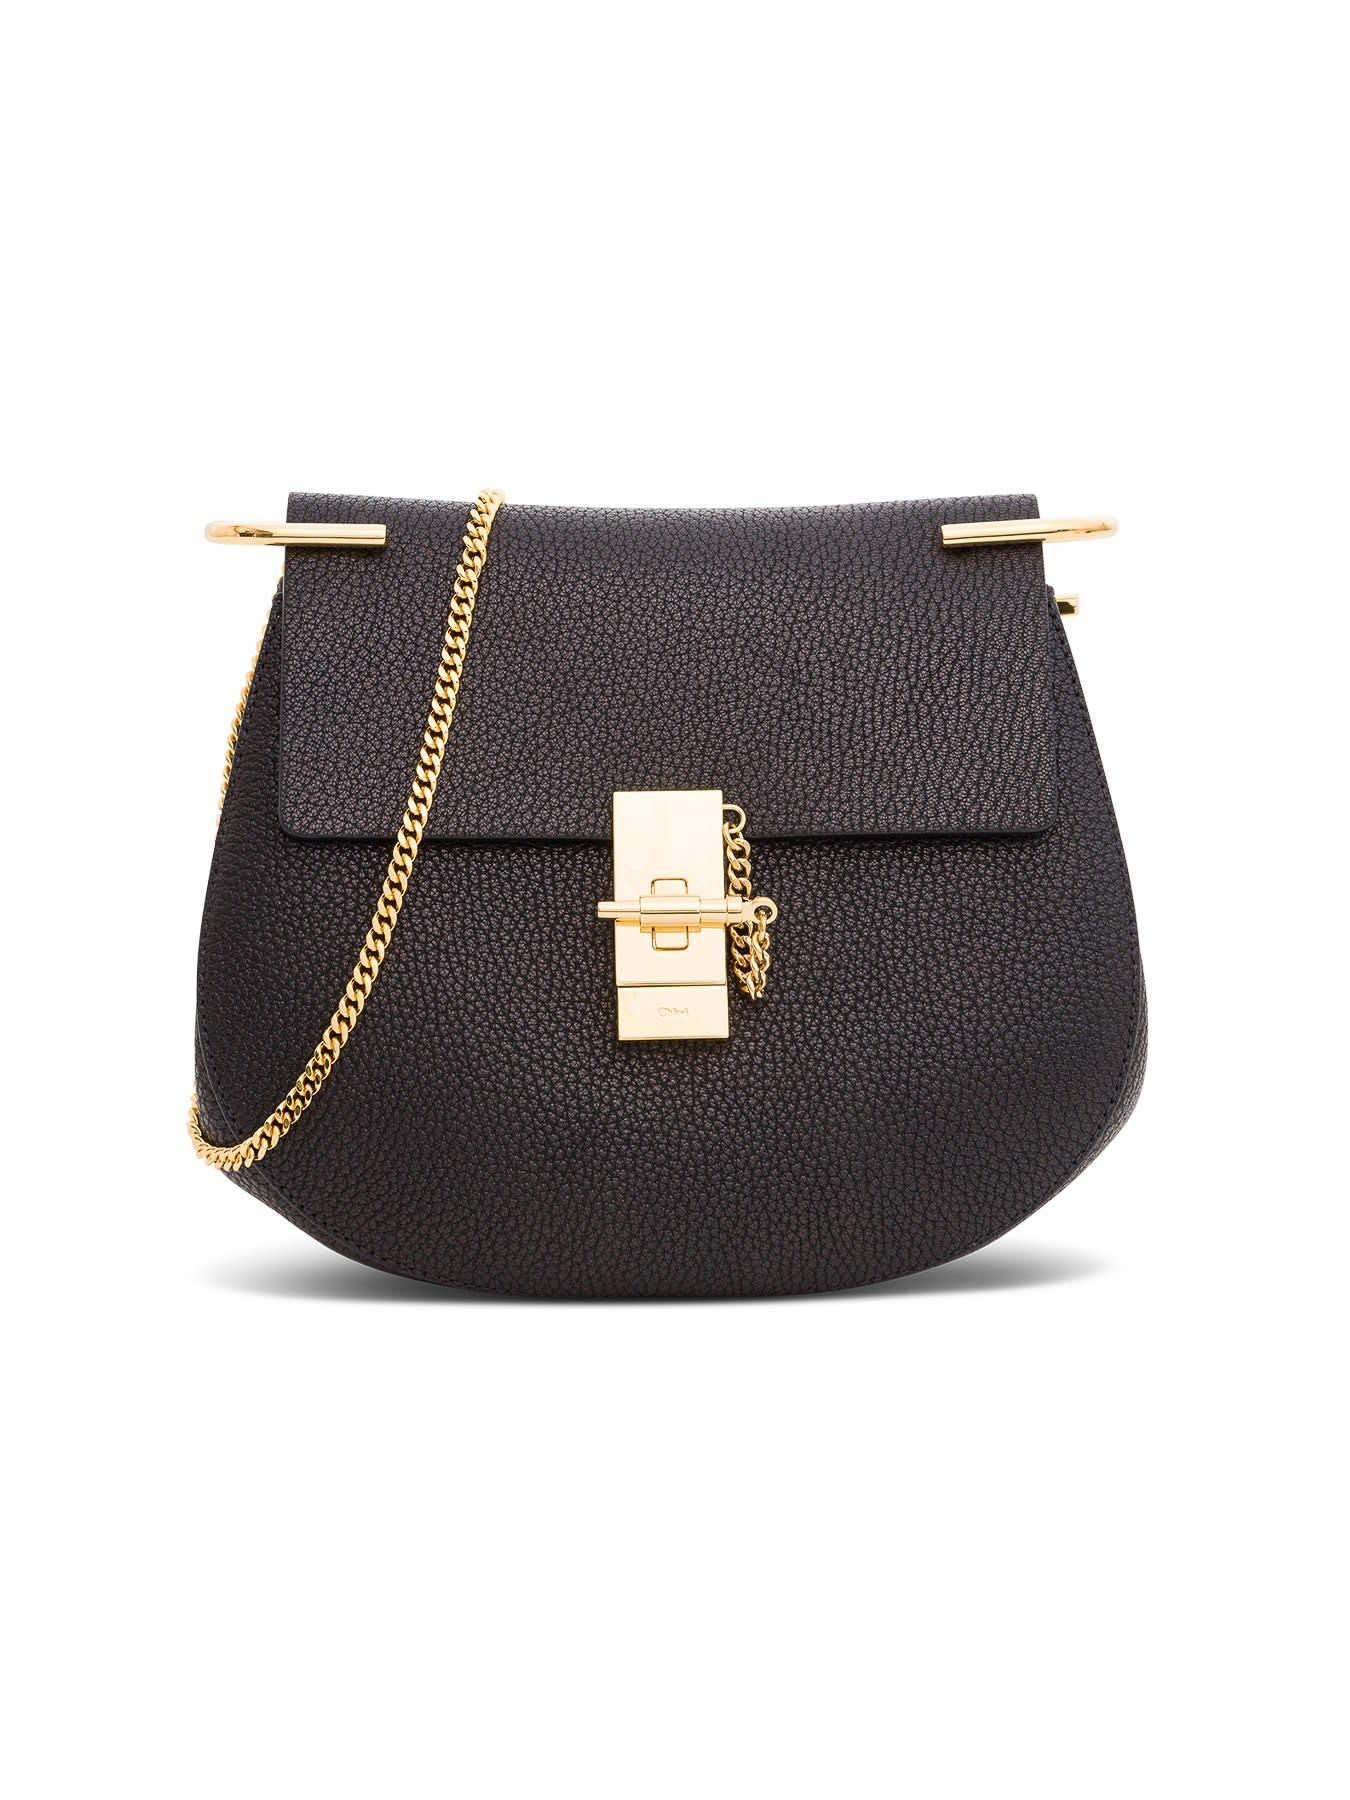 Crossbody bag Black Leather Single compartment Jewel closure Internal flat pocket Golden brass finish Chain shoulder strap Dimensions: 23x21x8 cm Shoulder strap length: 52 cmComposition: 100% Leather